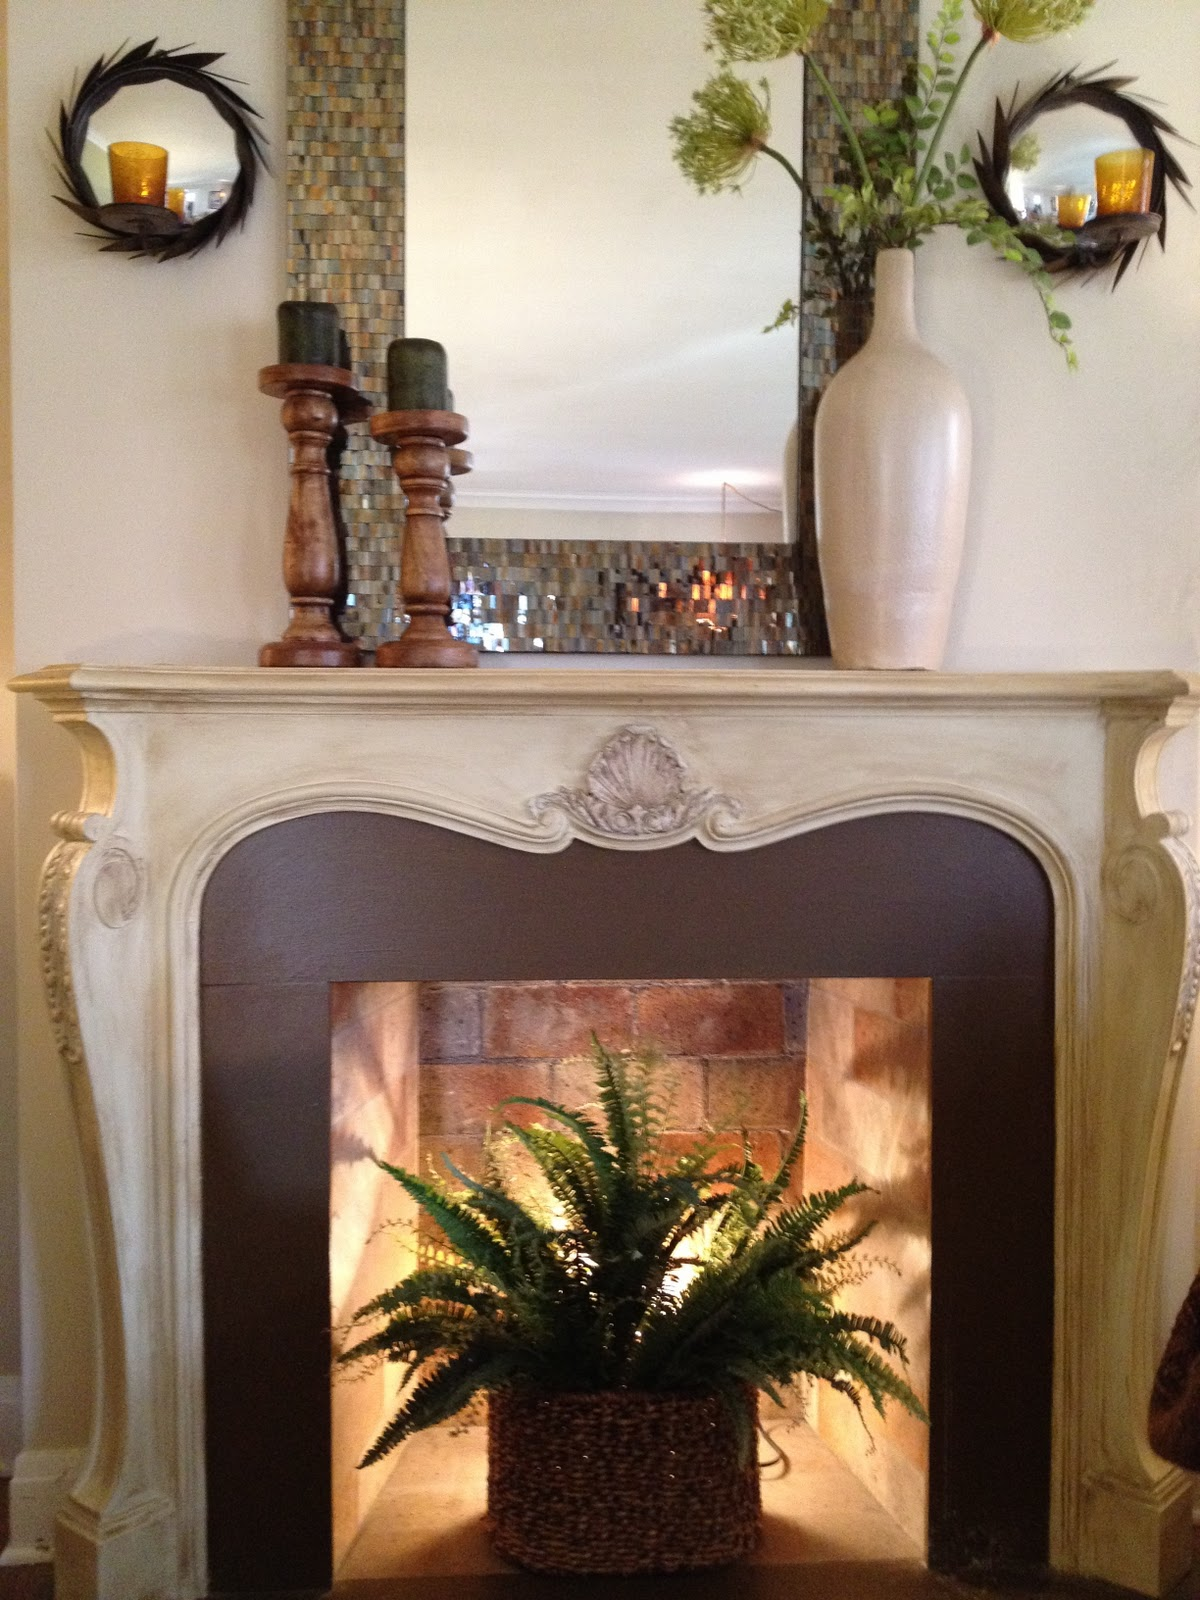 Amy scott interior design my living room - Decorating inside a fireplace ...